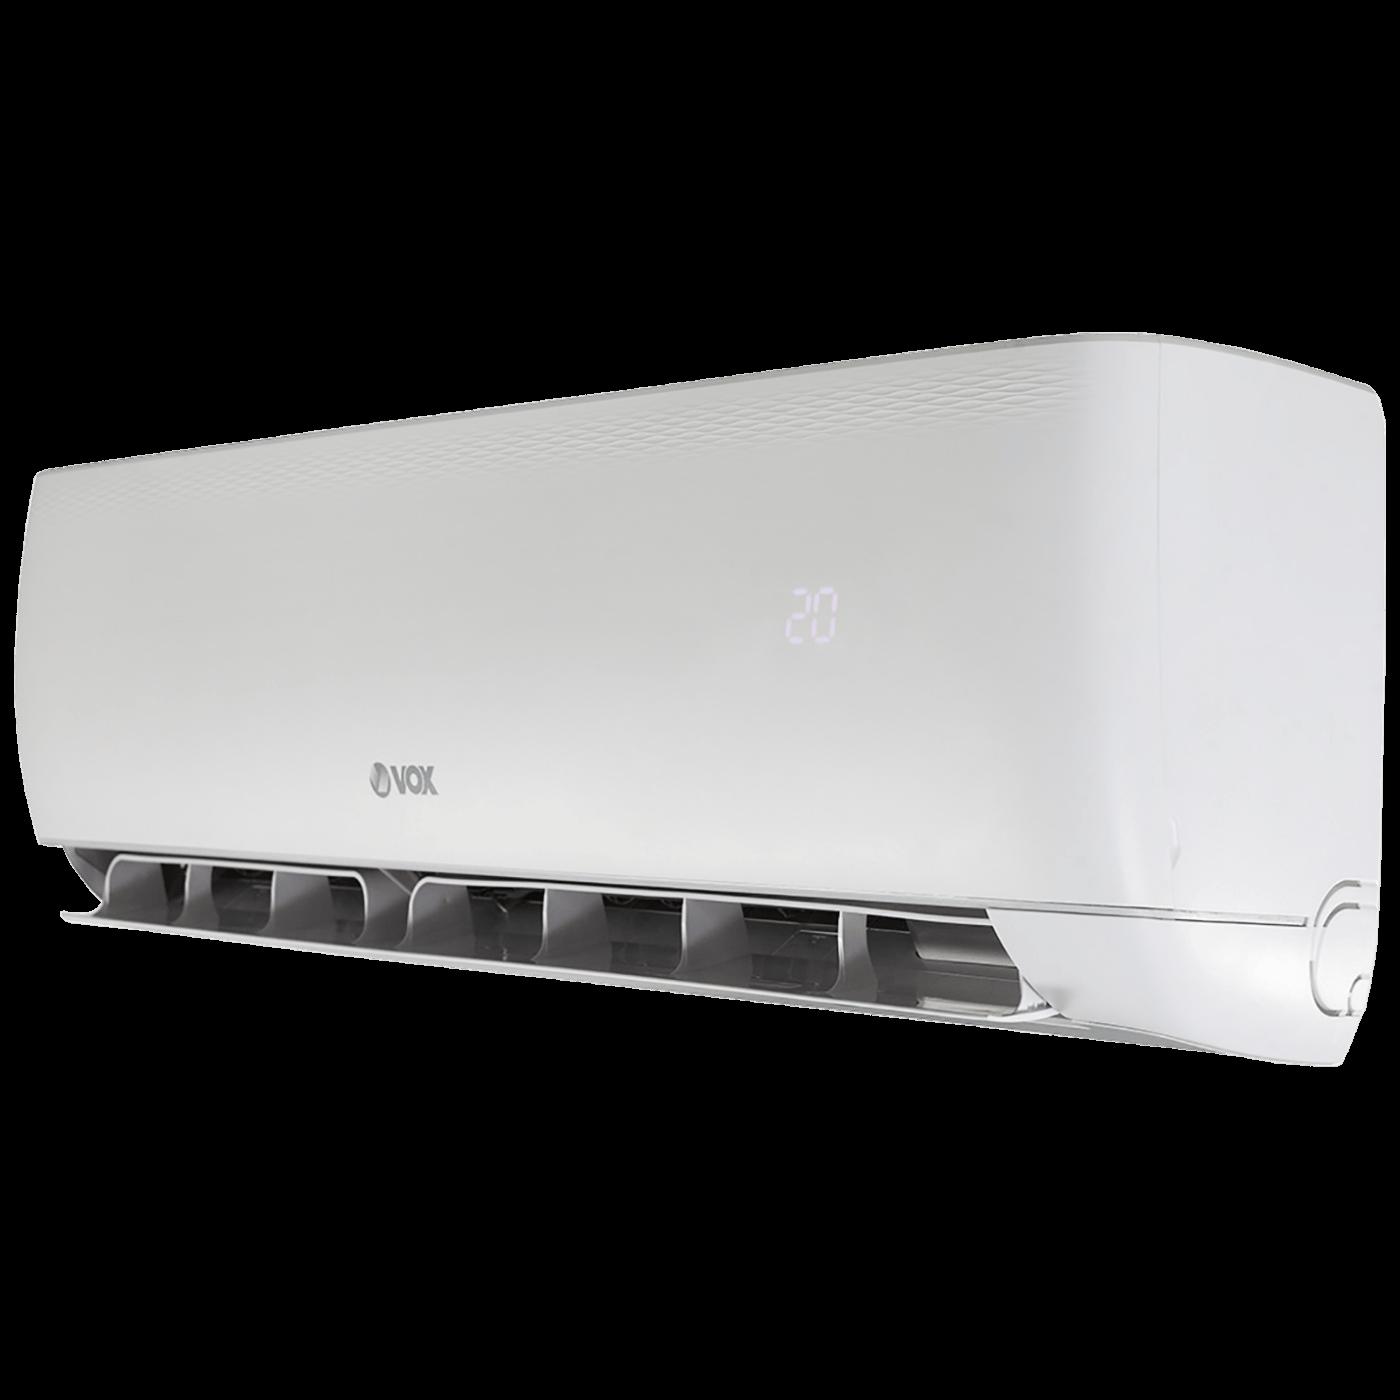 Klima uređaj, split sistem, 18000 bTu, inverter, A++/A+